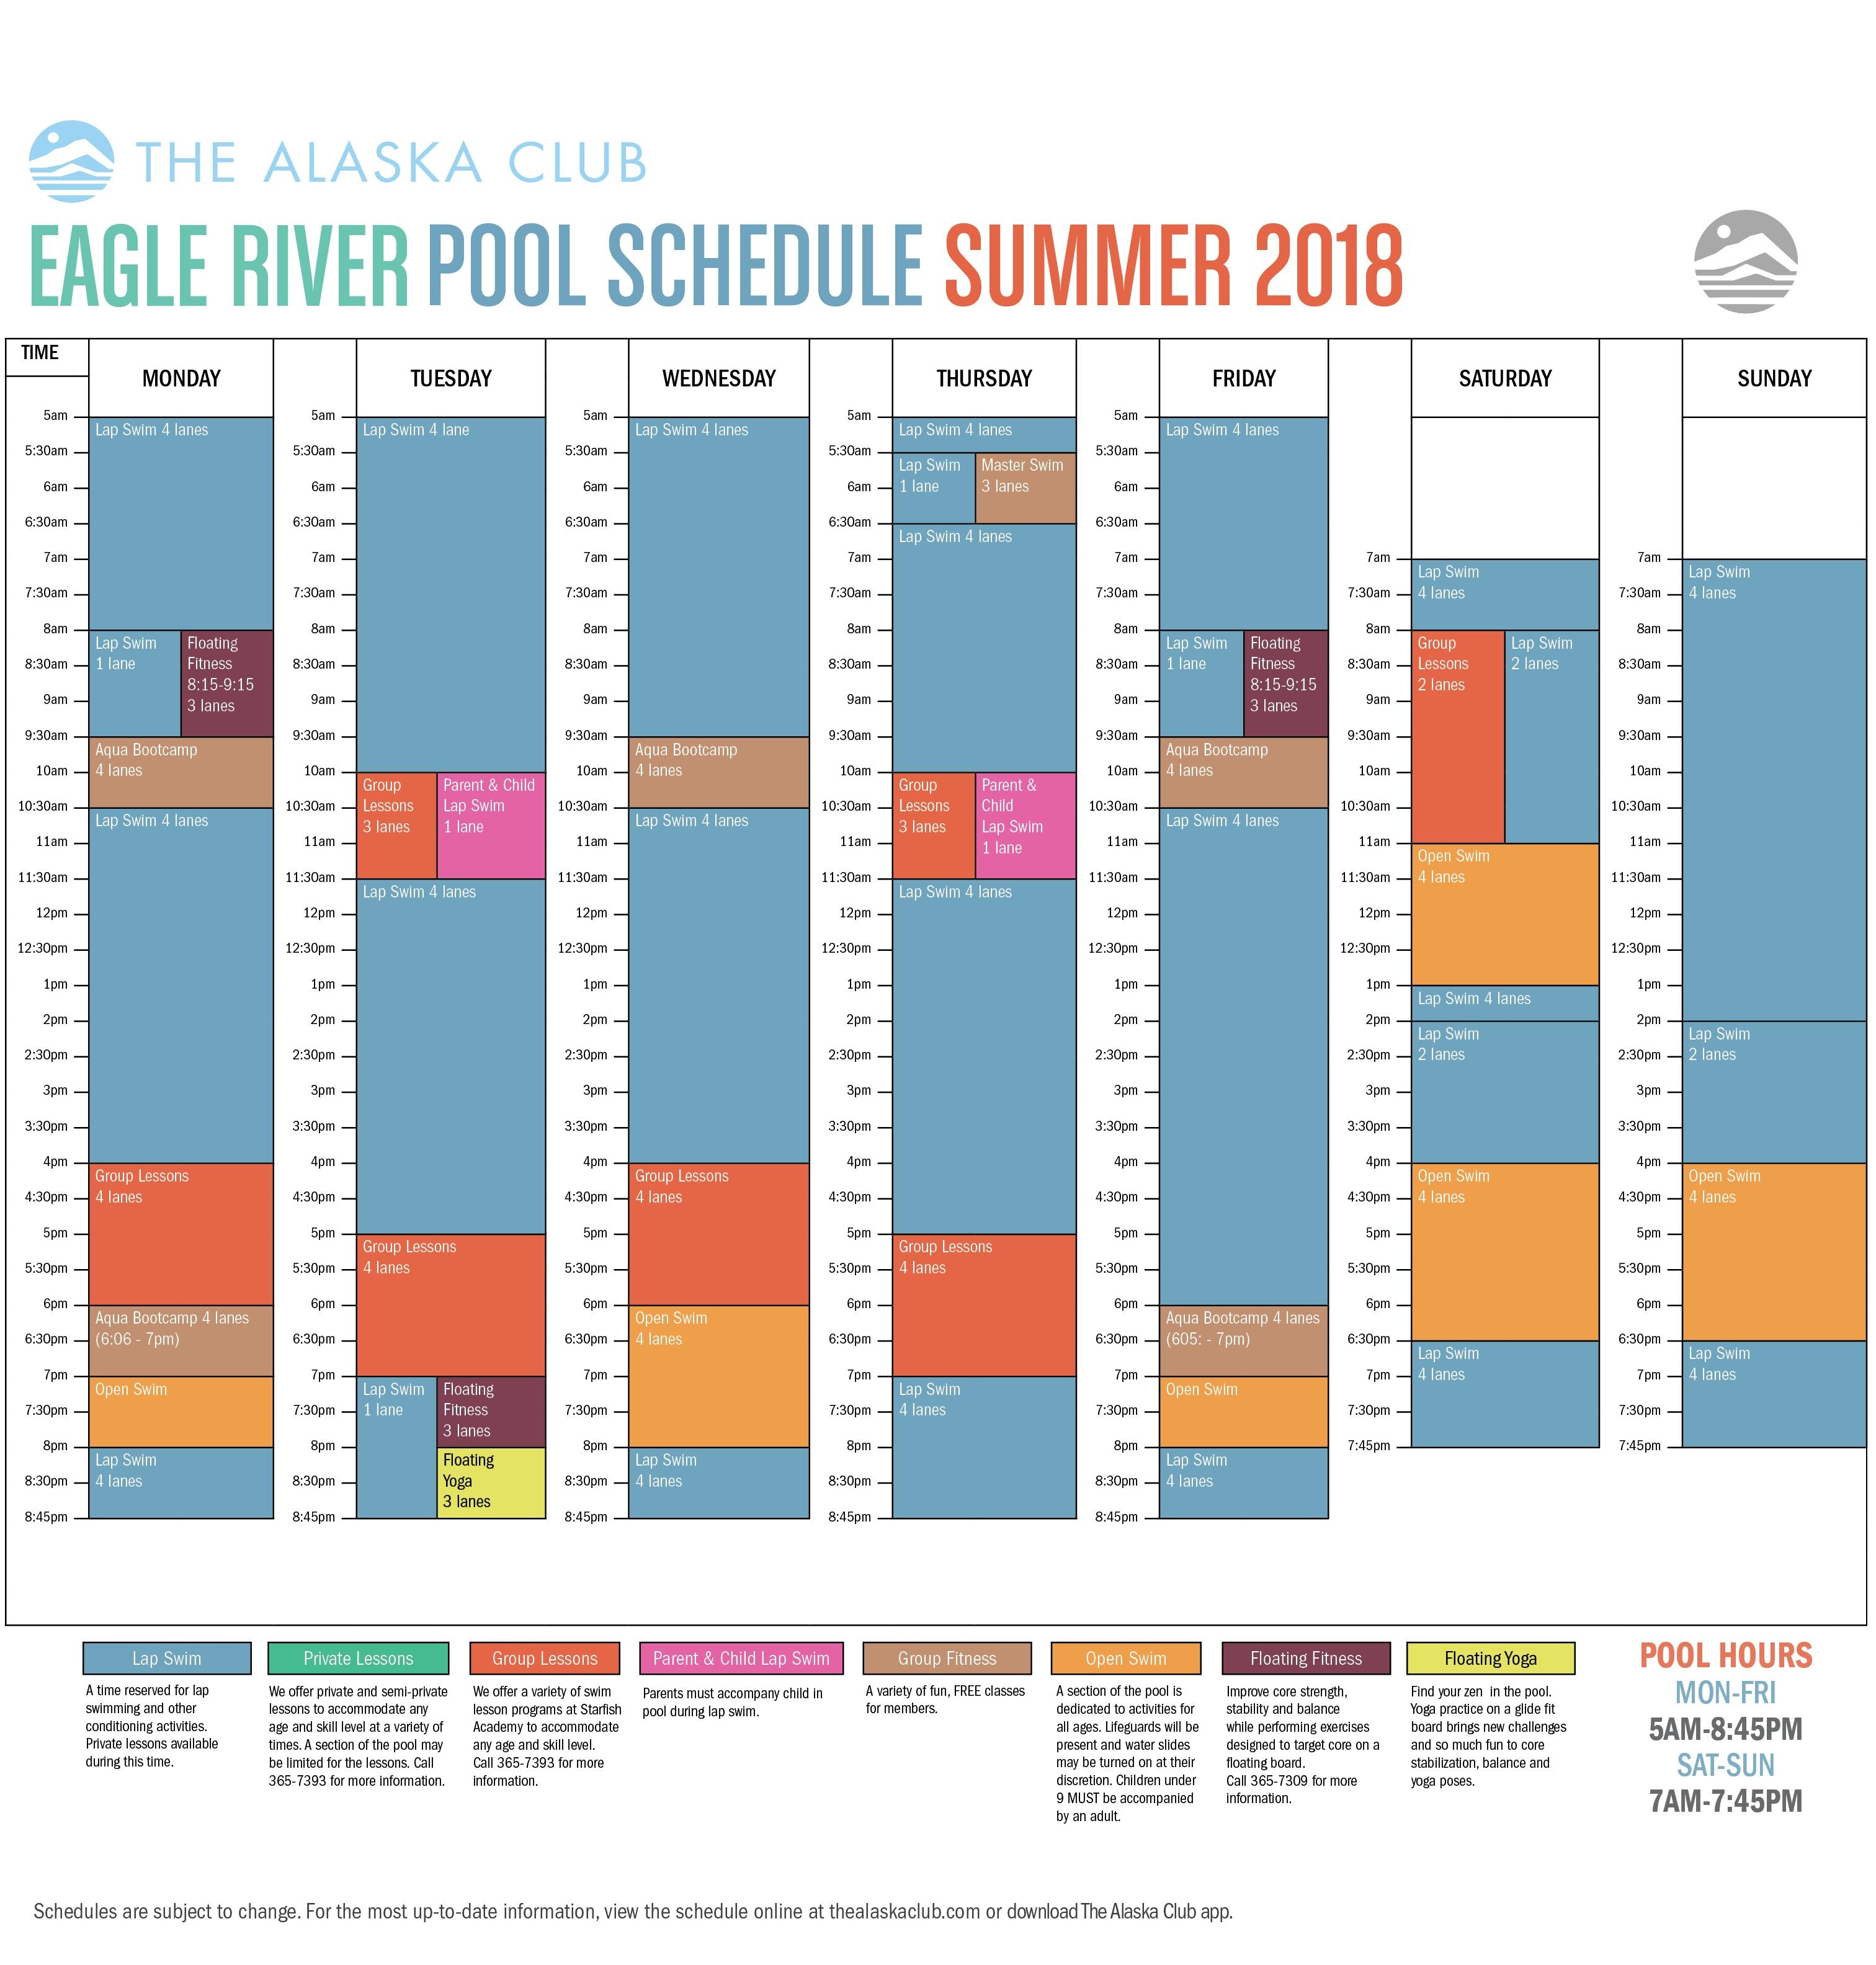 Summer 2018 Eagle River Pool Schedule